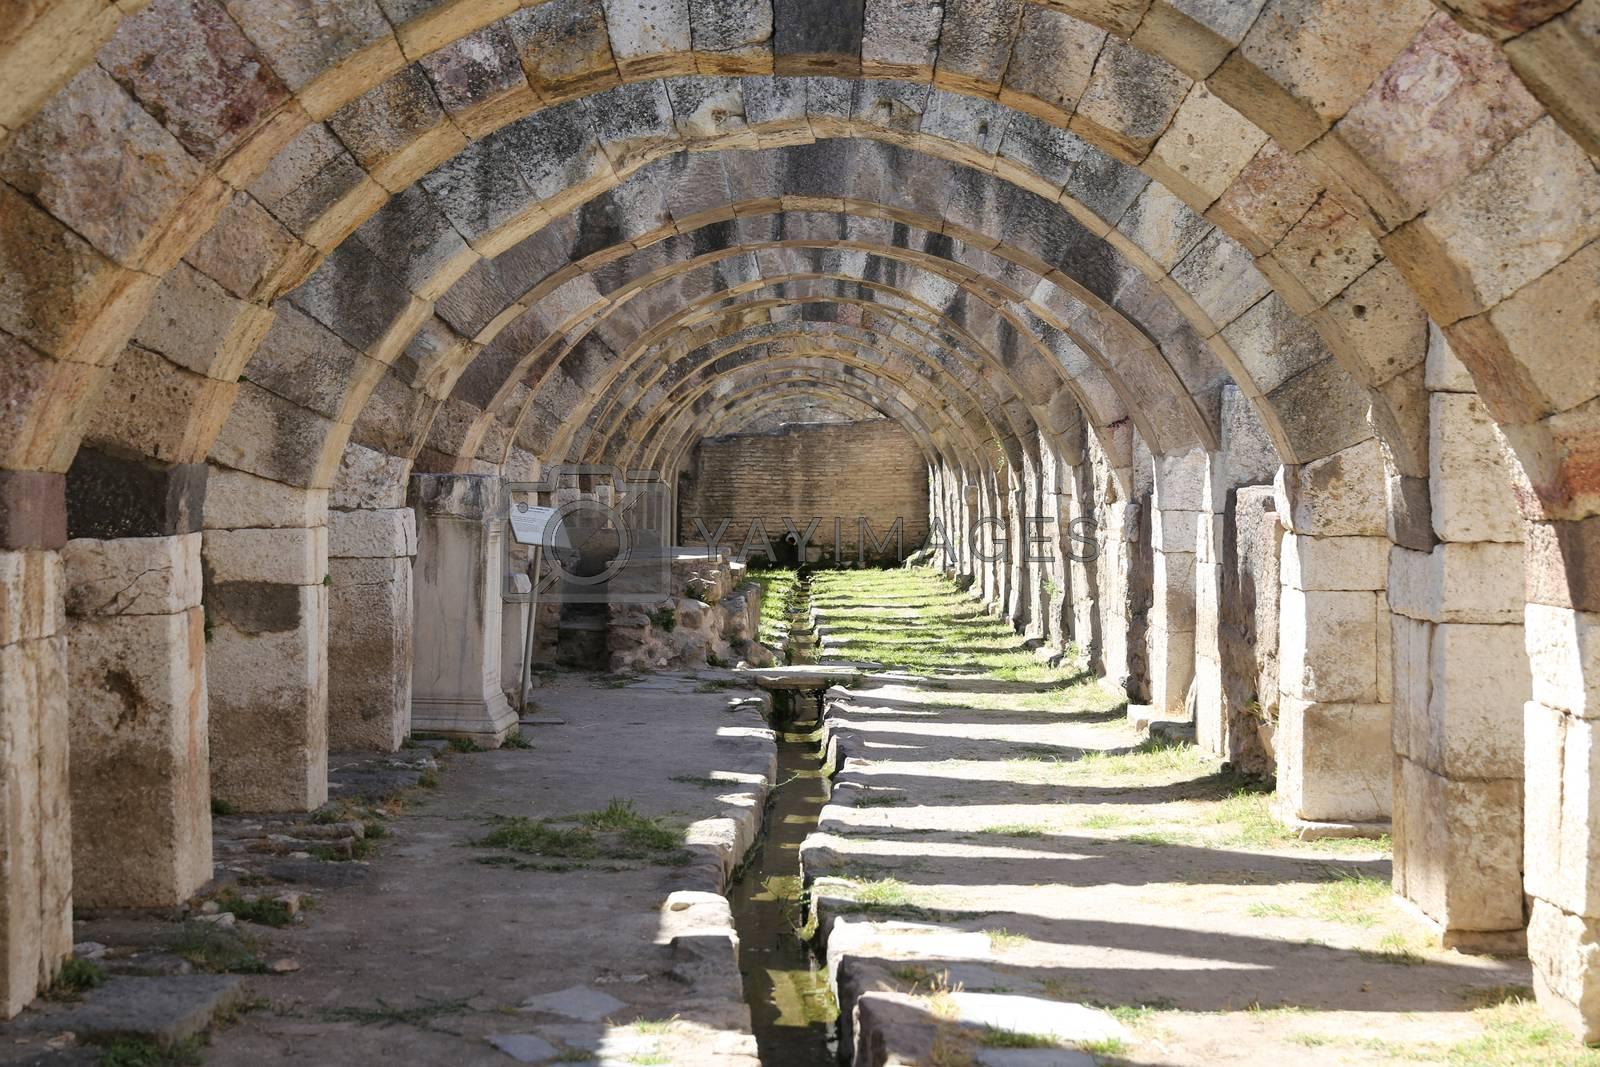 Royalty free image of Agora of Smyrna in Izmir, Turkey by EvrenKalinbacak